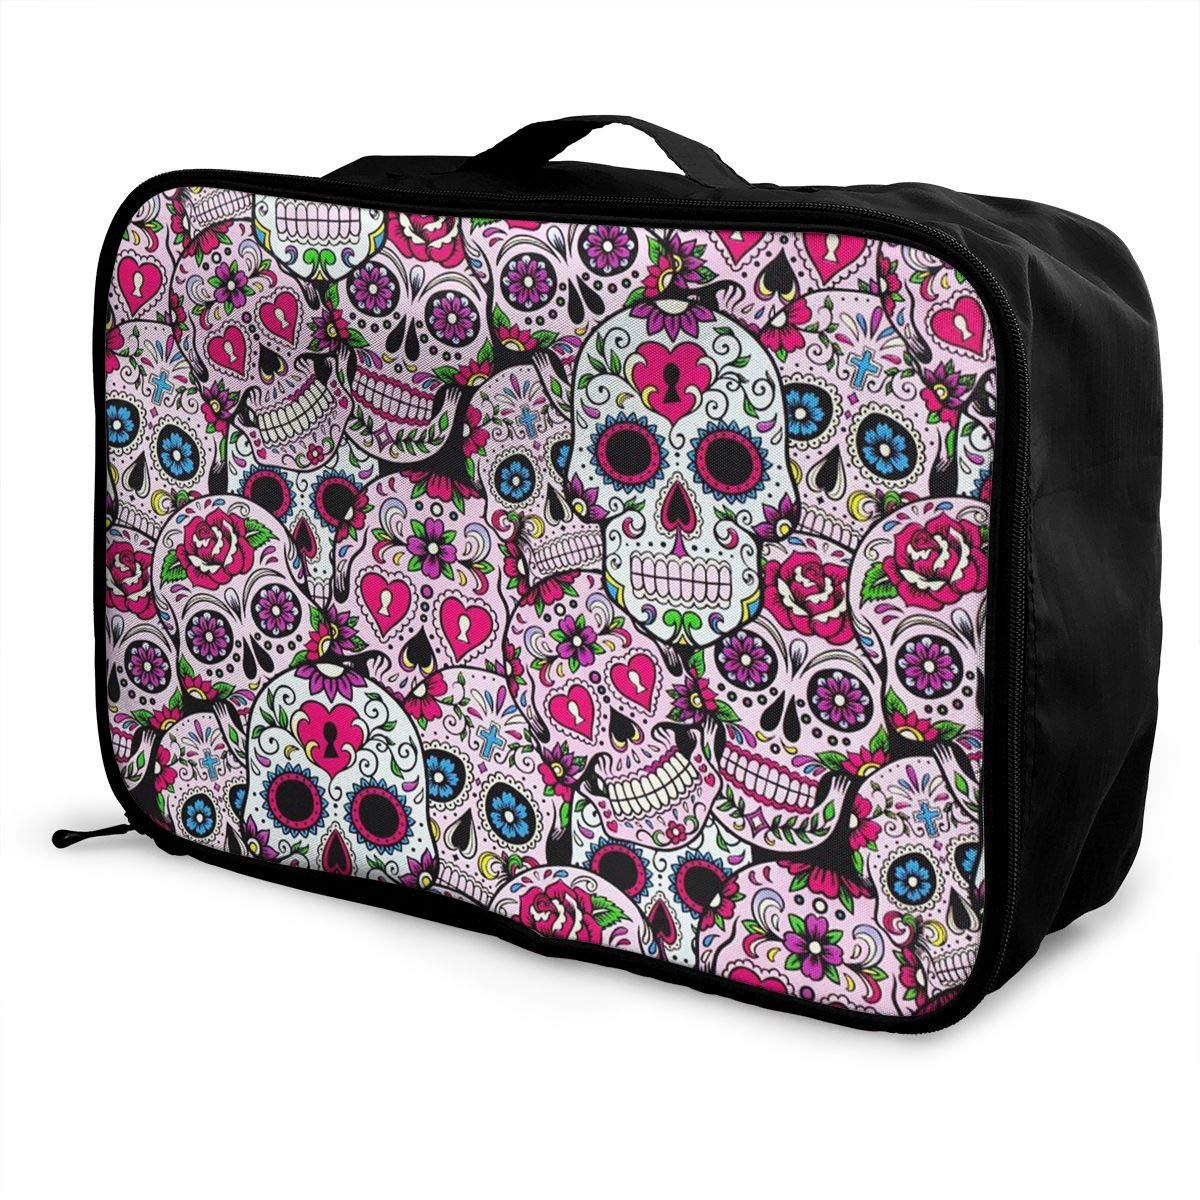 Sugar Skull Mexcian Pattern Travel Duffel Bag Casual Large Capacity Portable Luggage Bag Suitcase Storage Bag Luggage Packing Tote Bag Weekend Trip